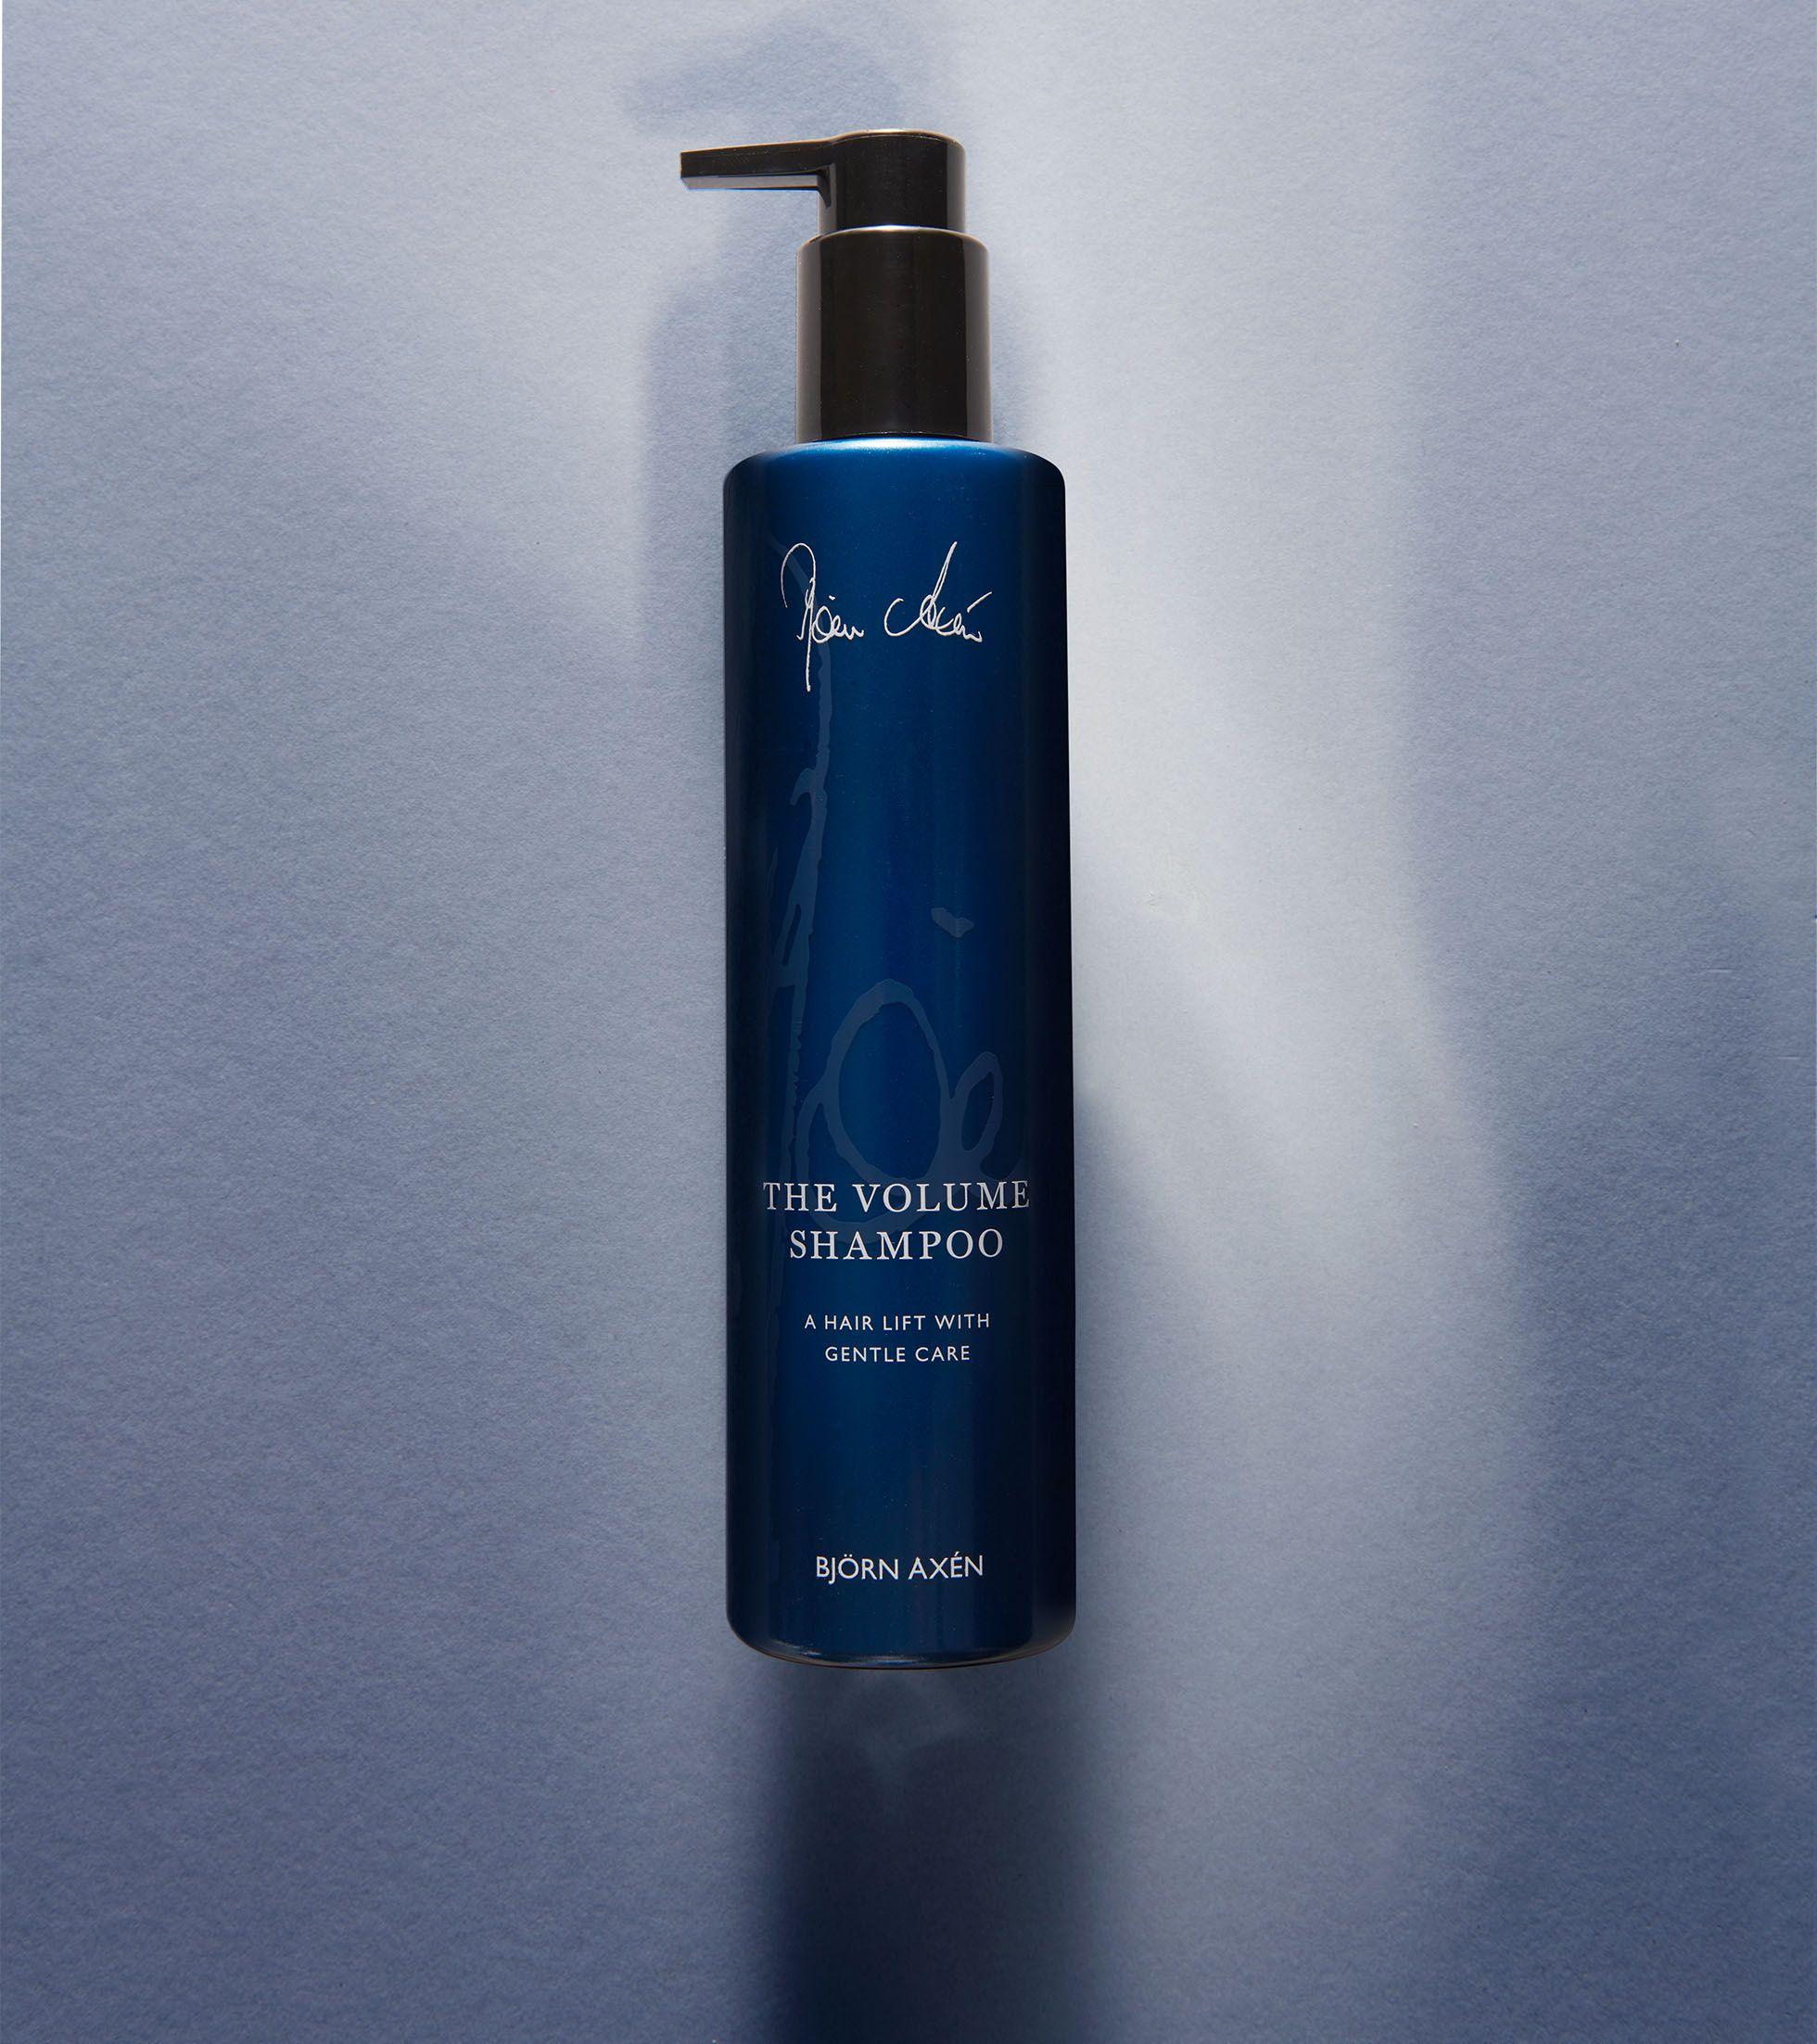 The Volume Shampoo